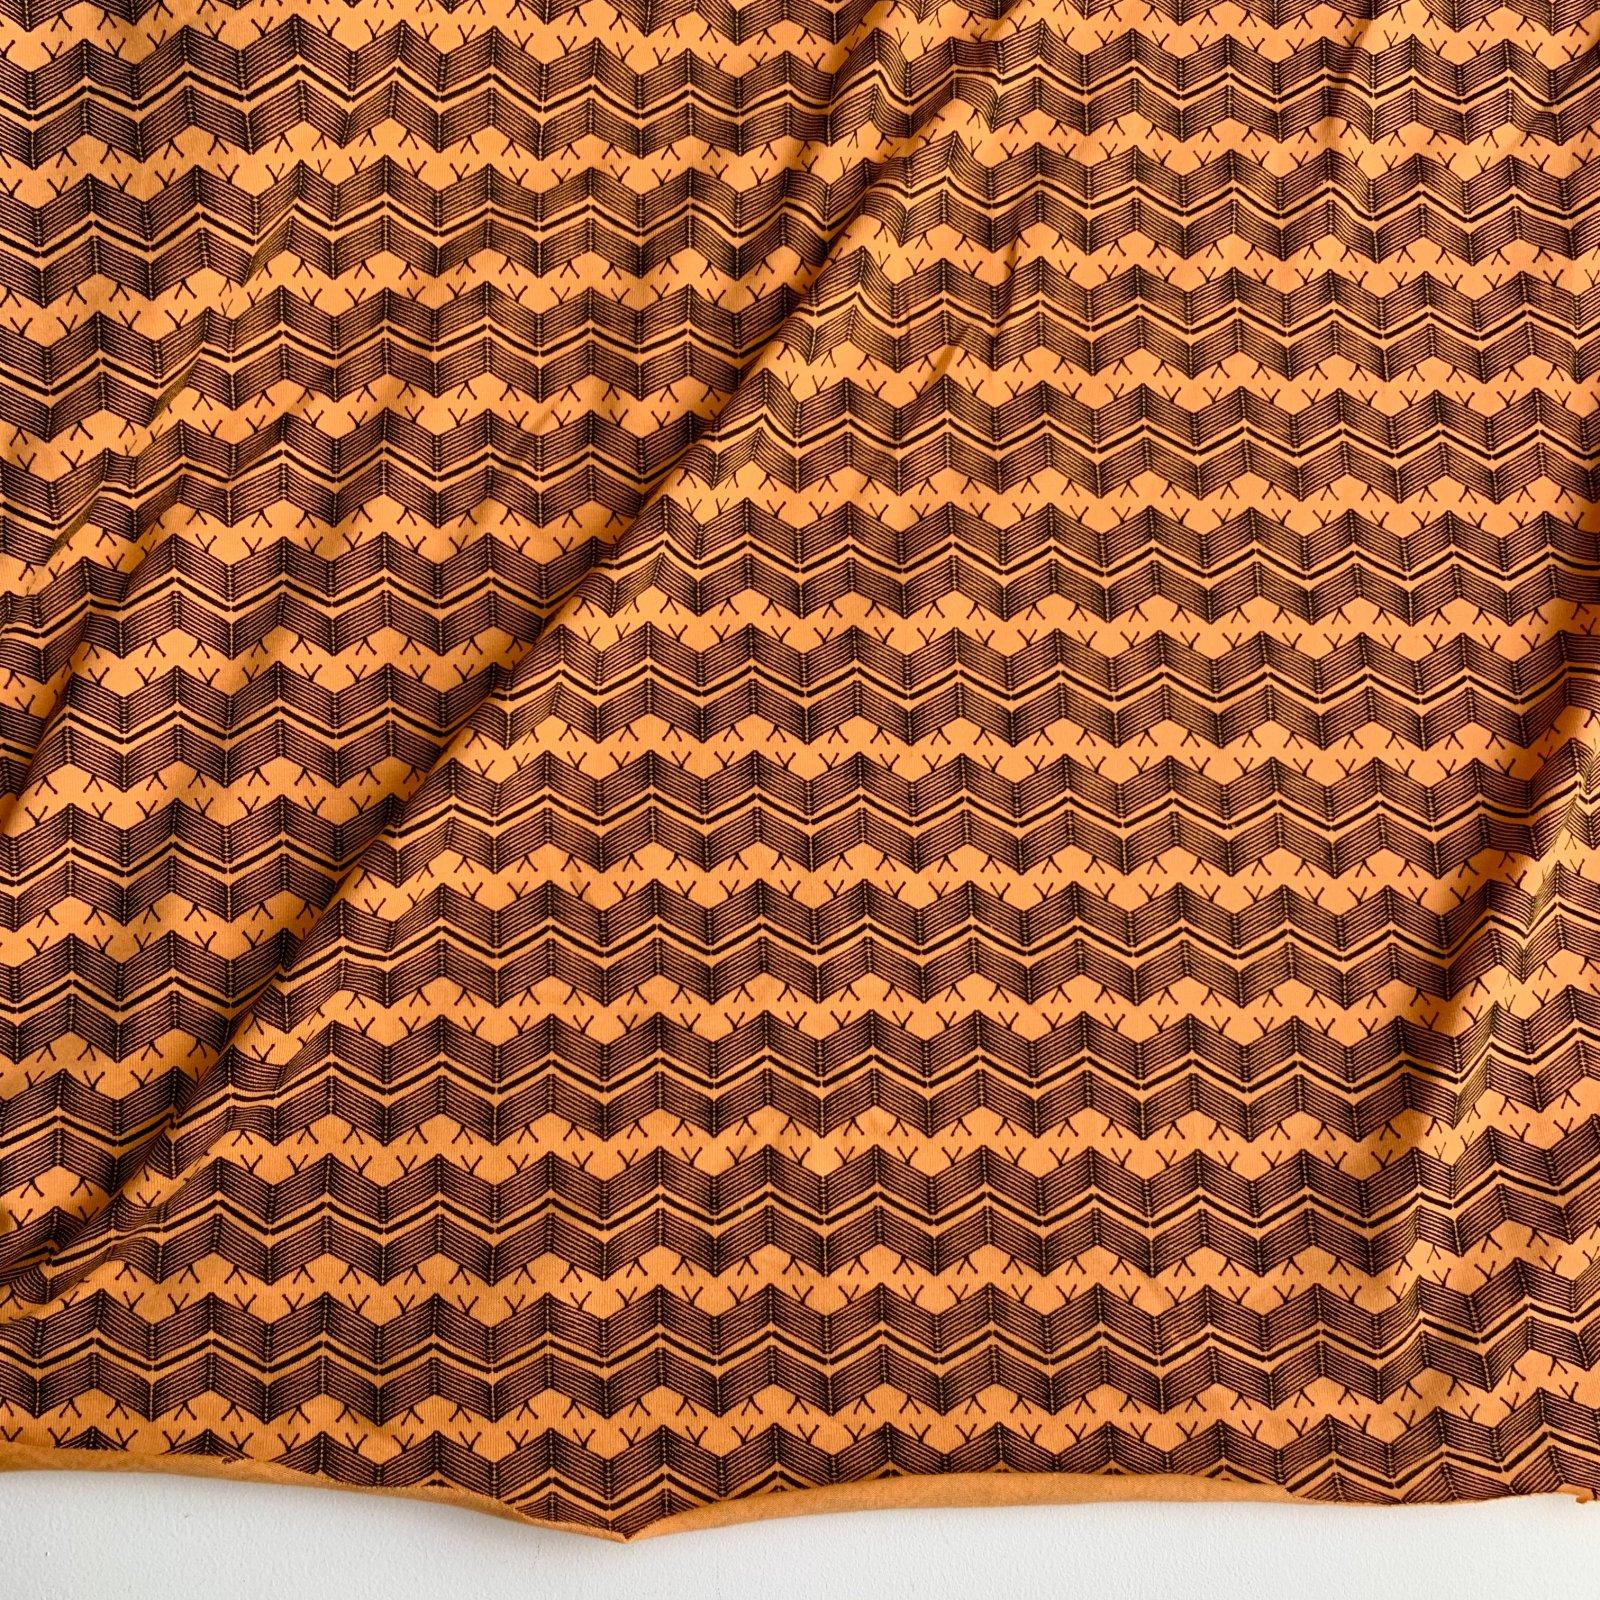 WEB ONLY - Designer Deadstock Organic Cotton Stretch Jersey - Bright Orange Zigzag 60